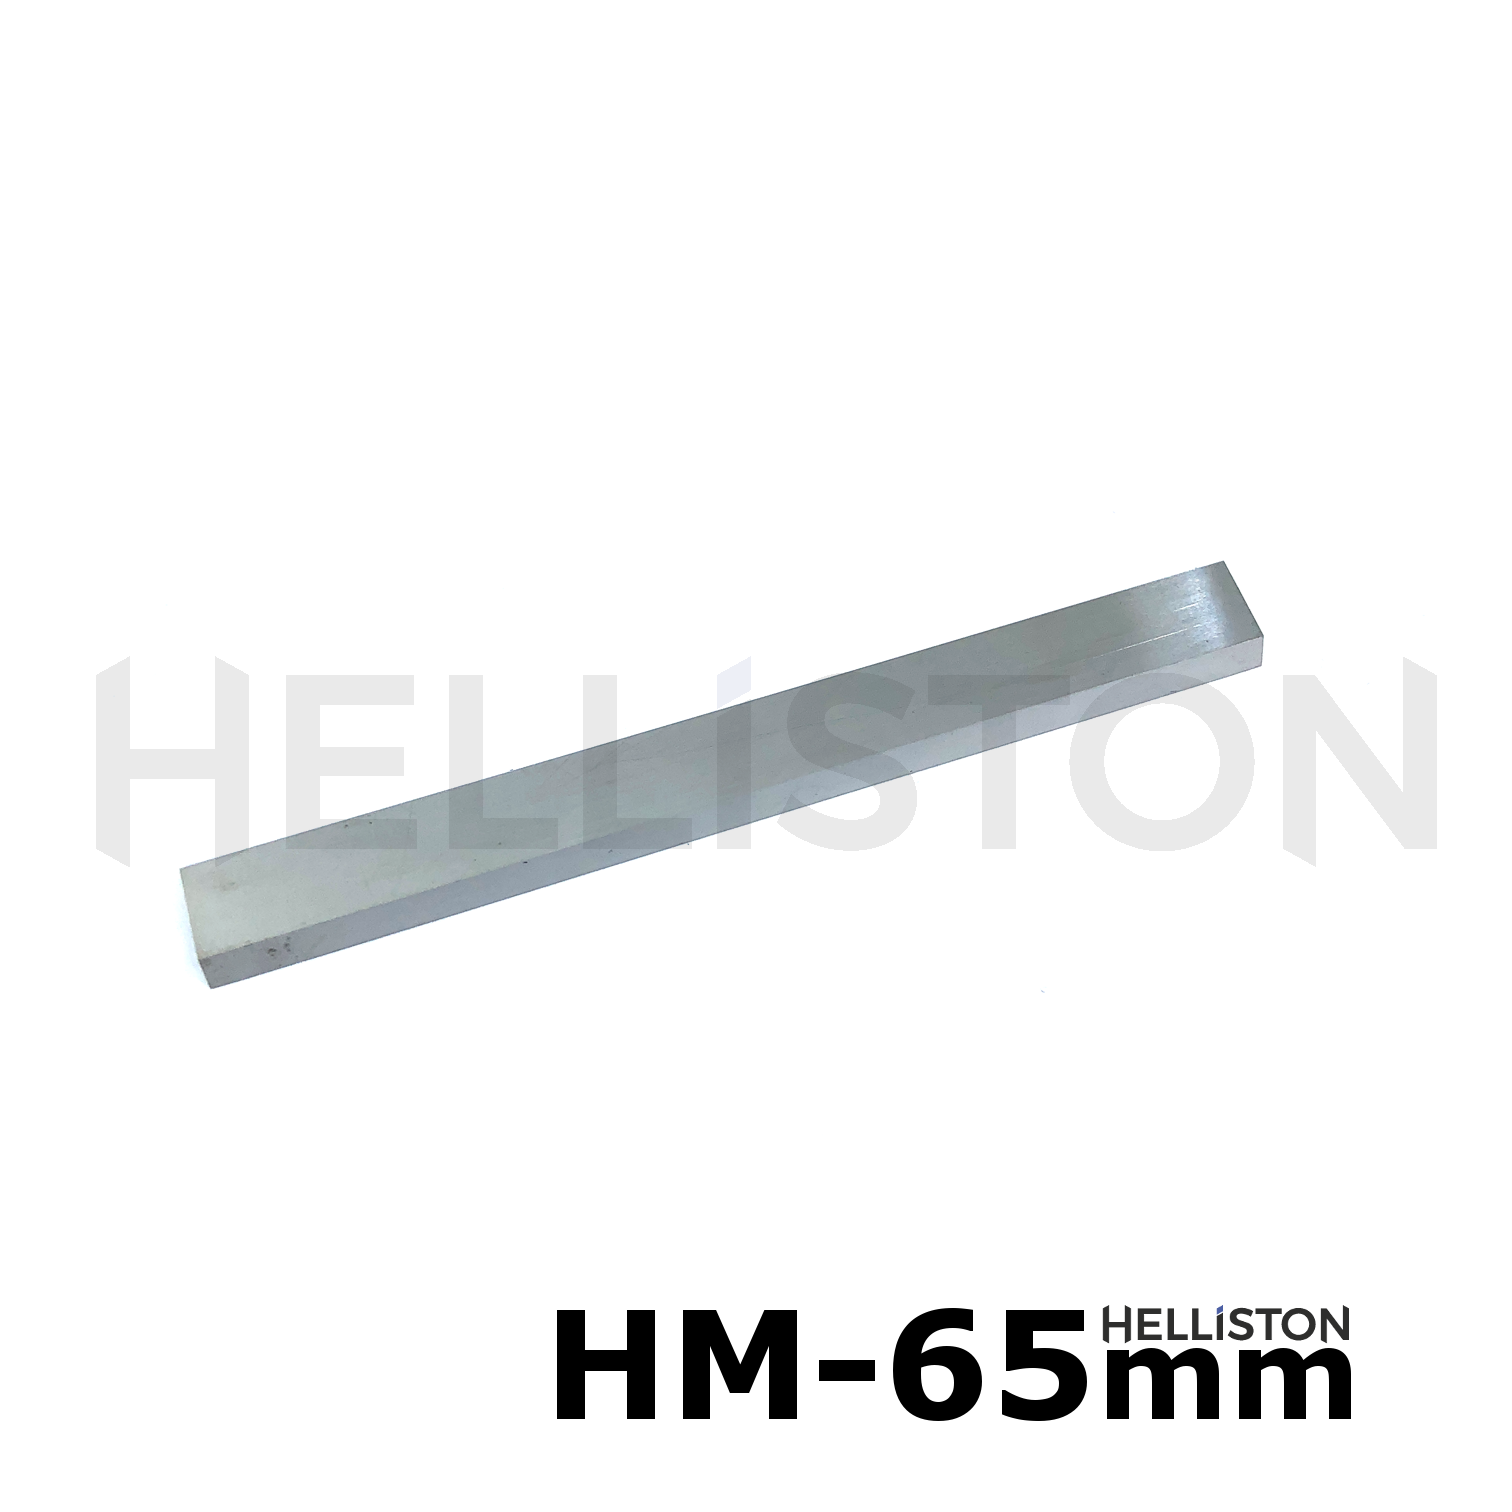 Carbide Blade 65mm For Paint Scraper 1 Pc For Bacho Sandvik